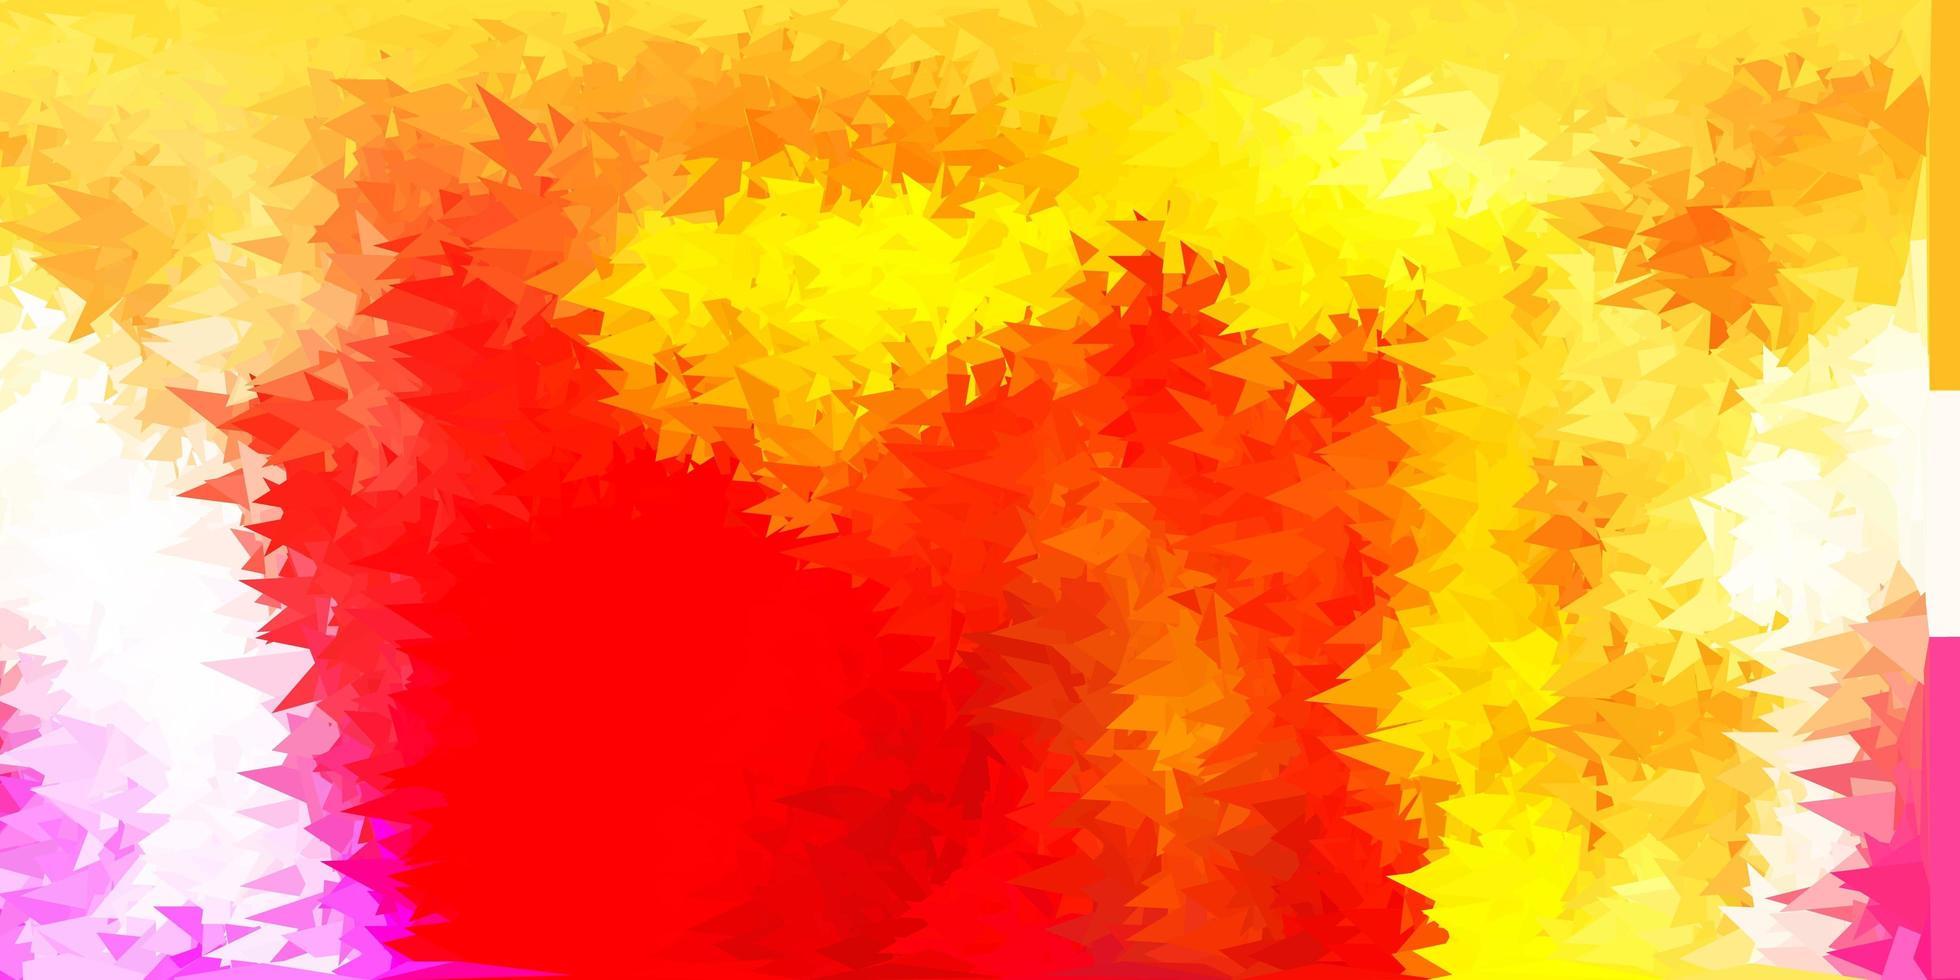 ljusröd, gul vektor geometrisk polygonal layout.